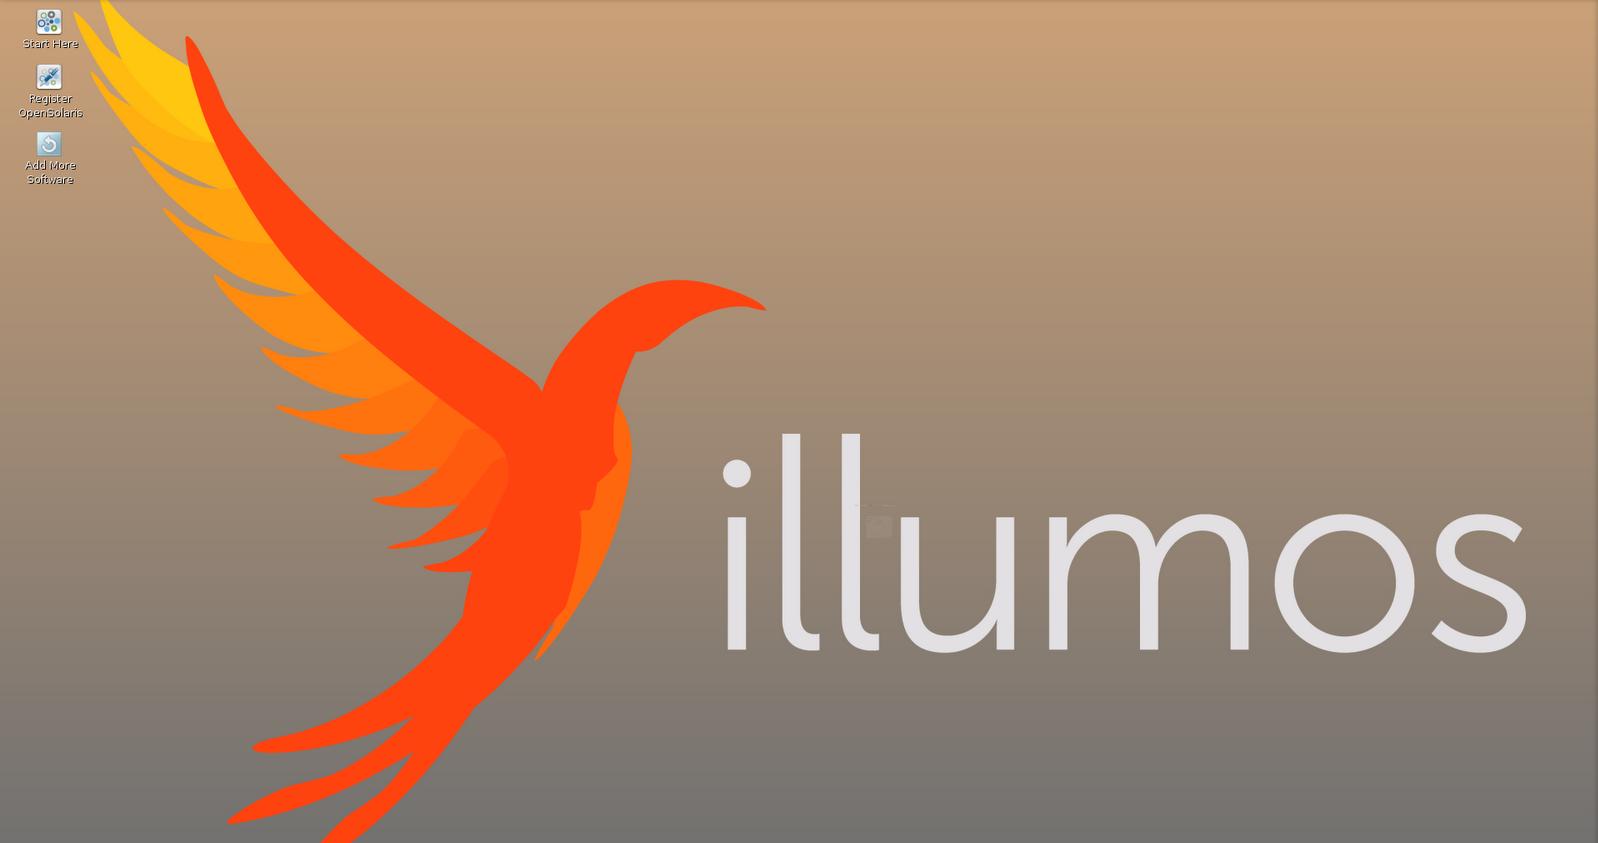 Illumos logo